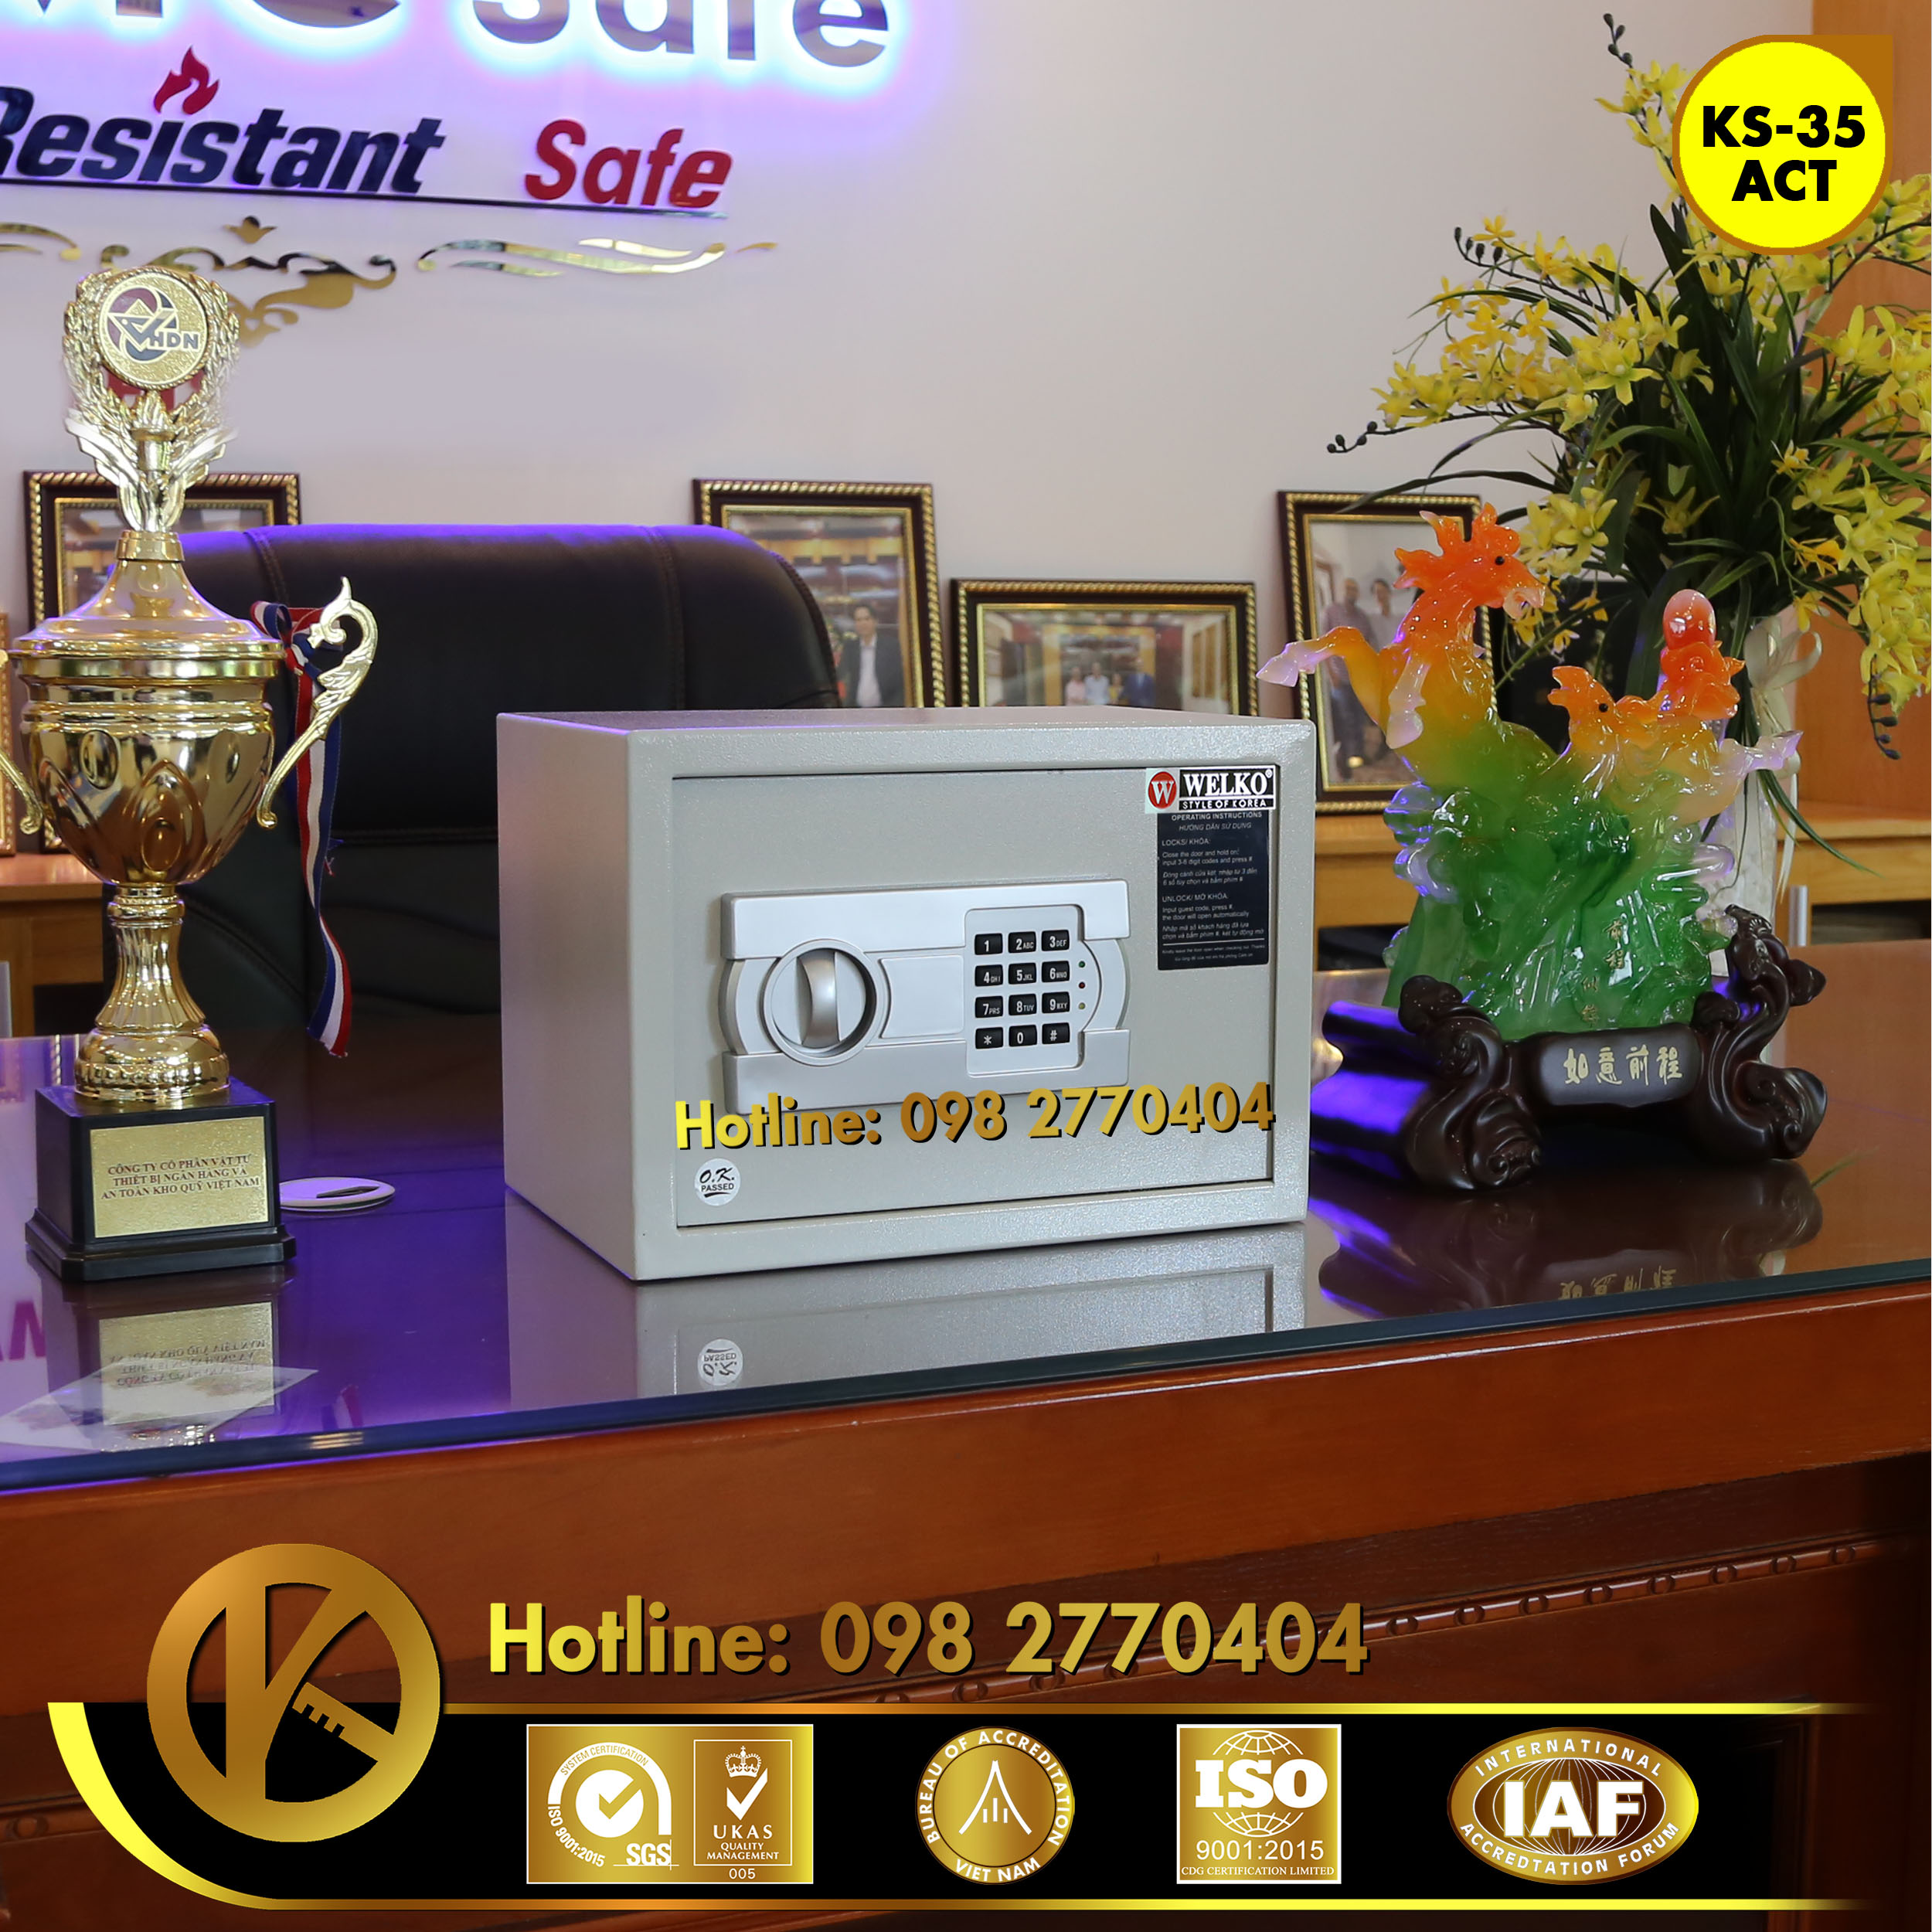 cửa hàng bán Ket Sat Khach San Hotel Safe Tinh Binh Thuan